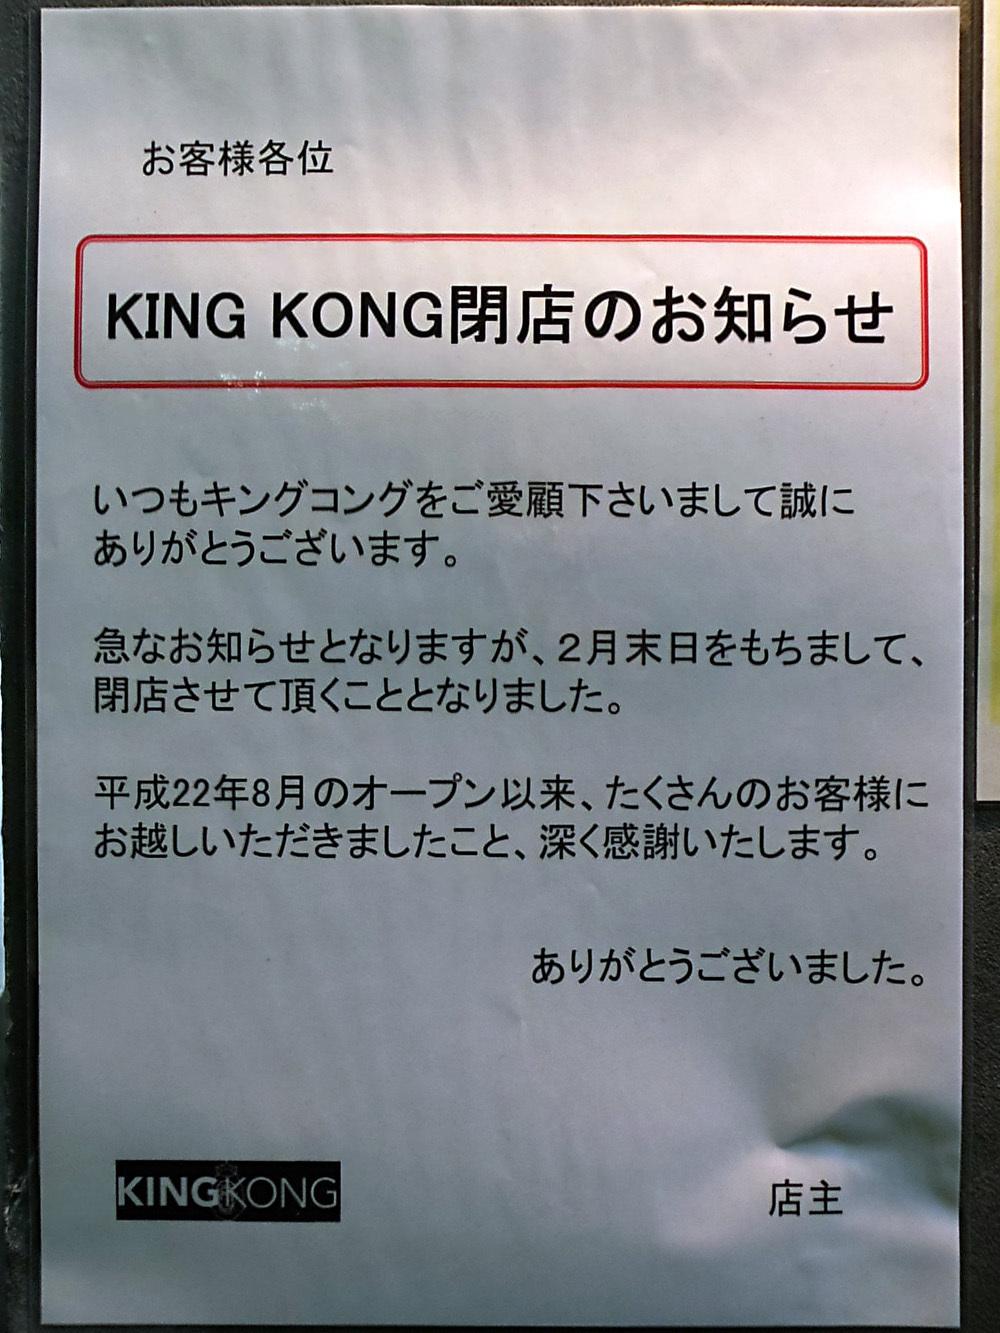 KINGKONG閉店のお知らせ.jpg